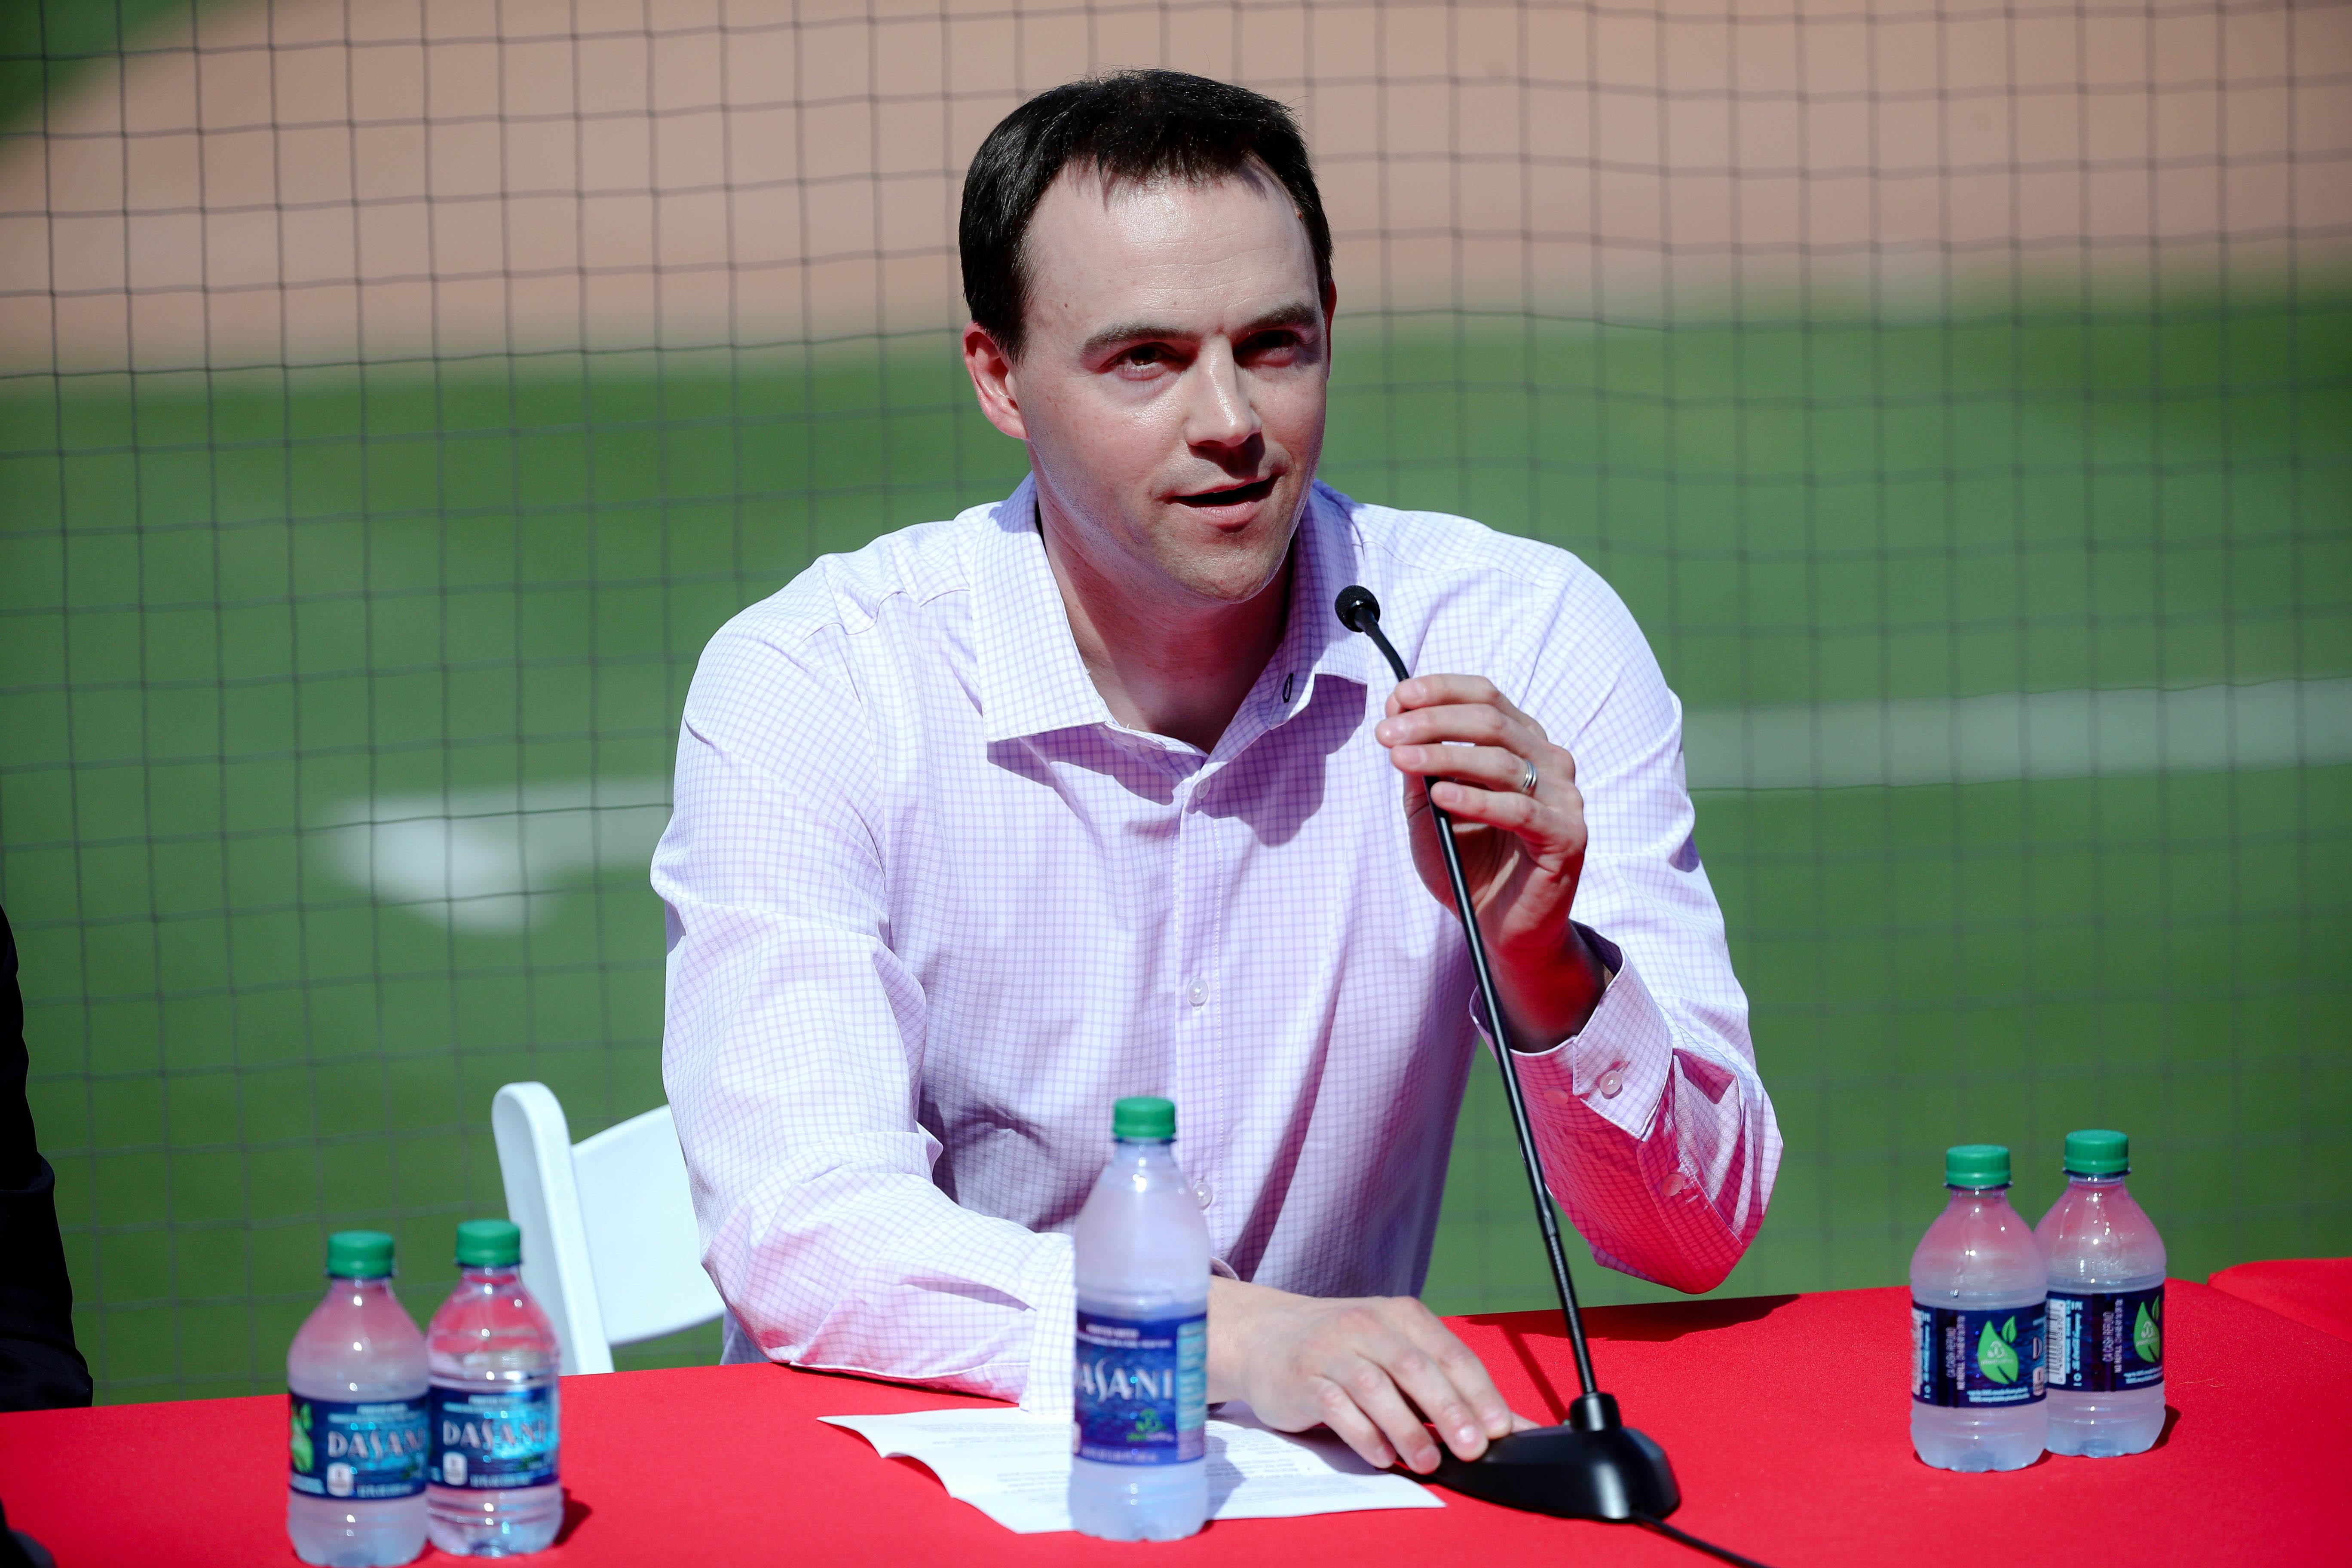 MLB: Philadelphia Phillies-Bryce Harper Press Conference